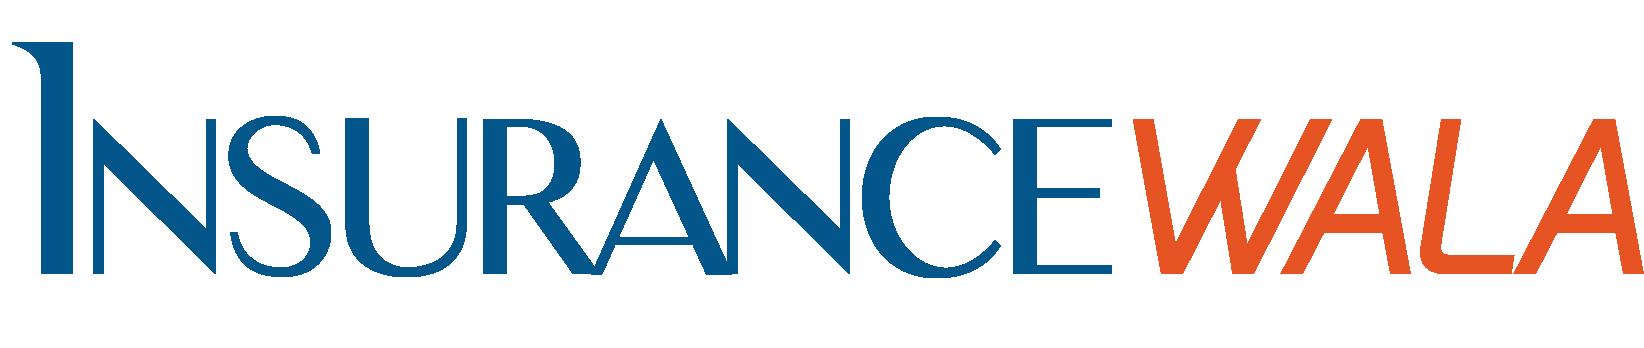 InsuranceWala Logo